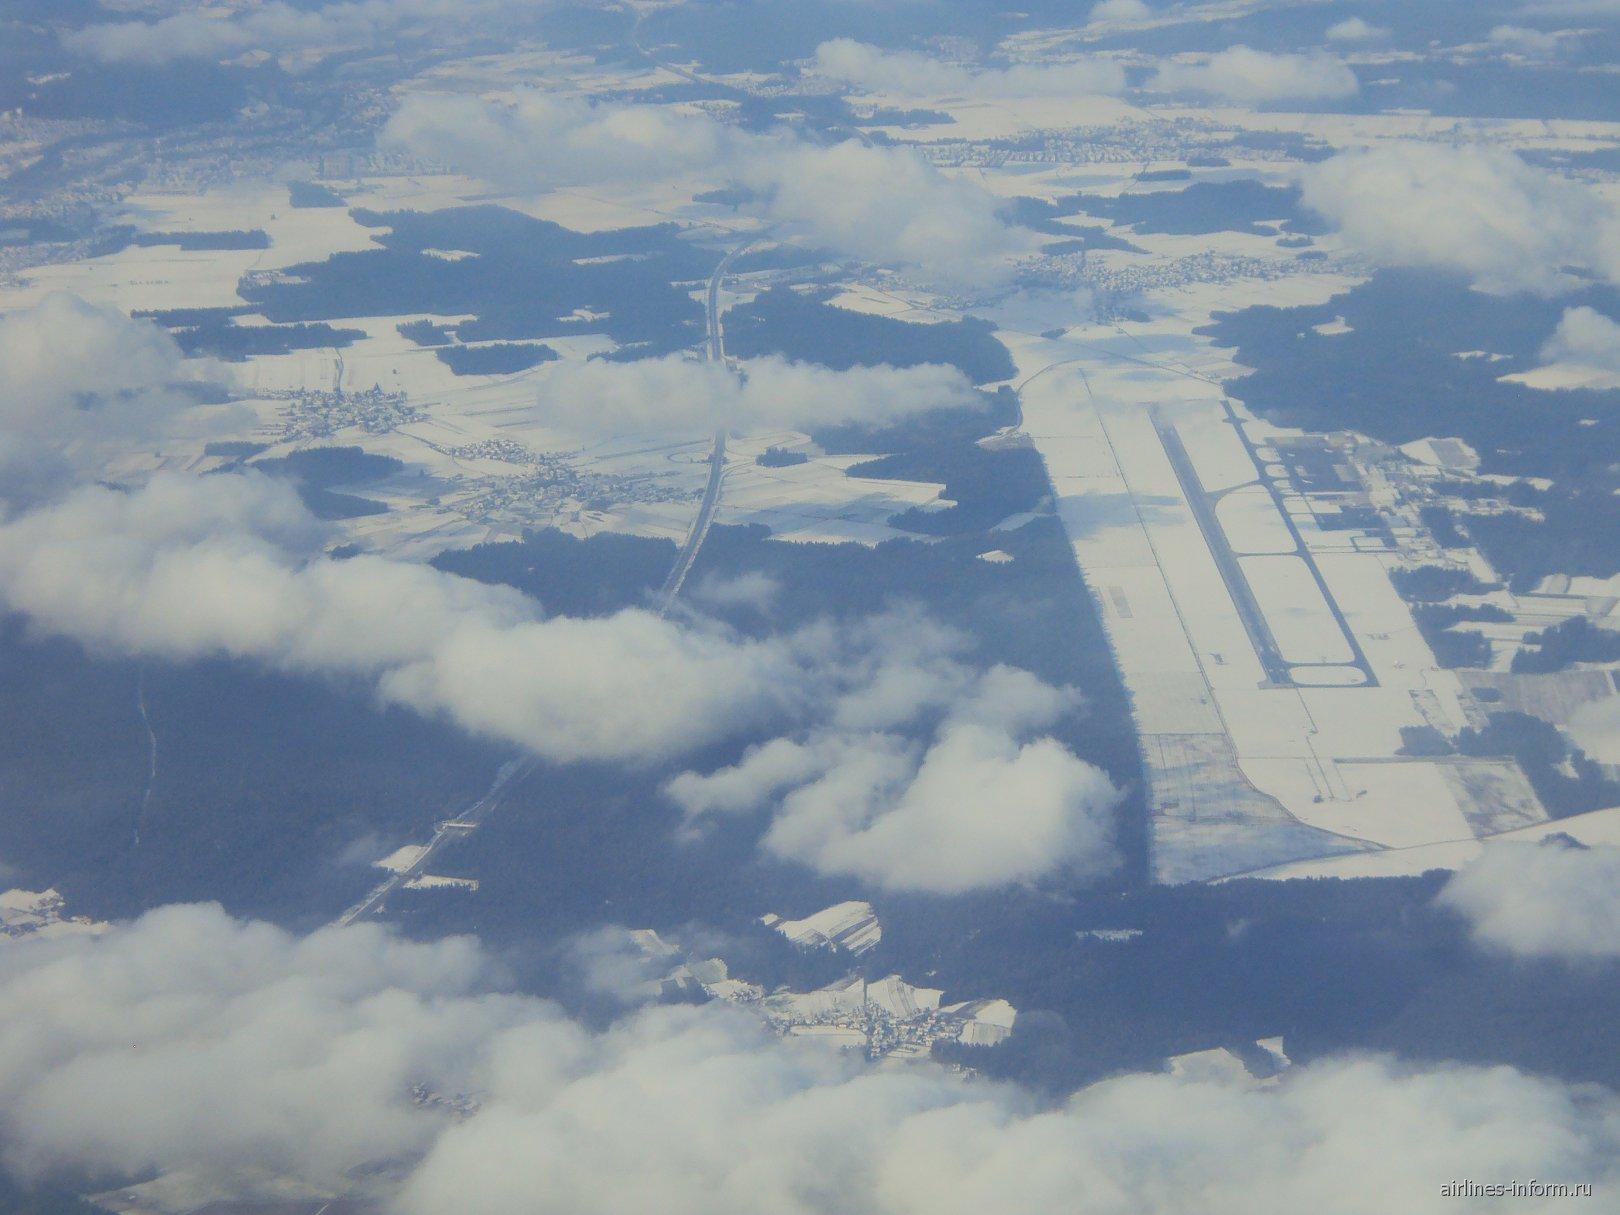 Вид сверху на аэропорт Любляна